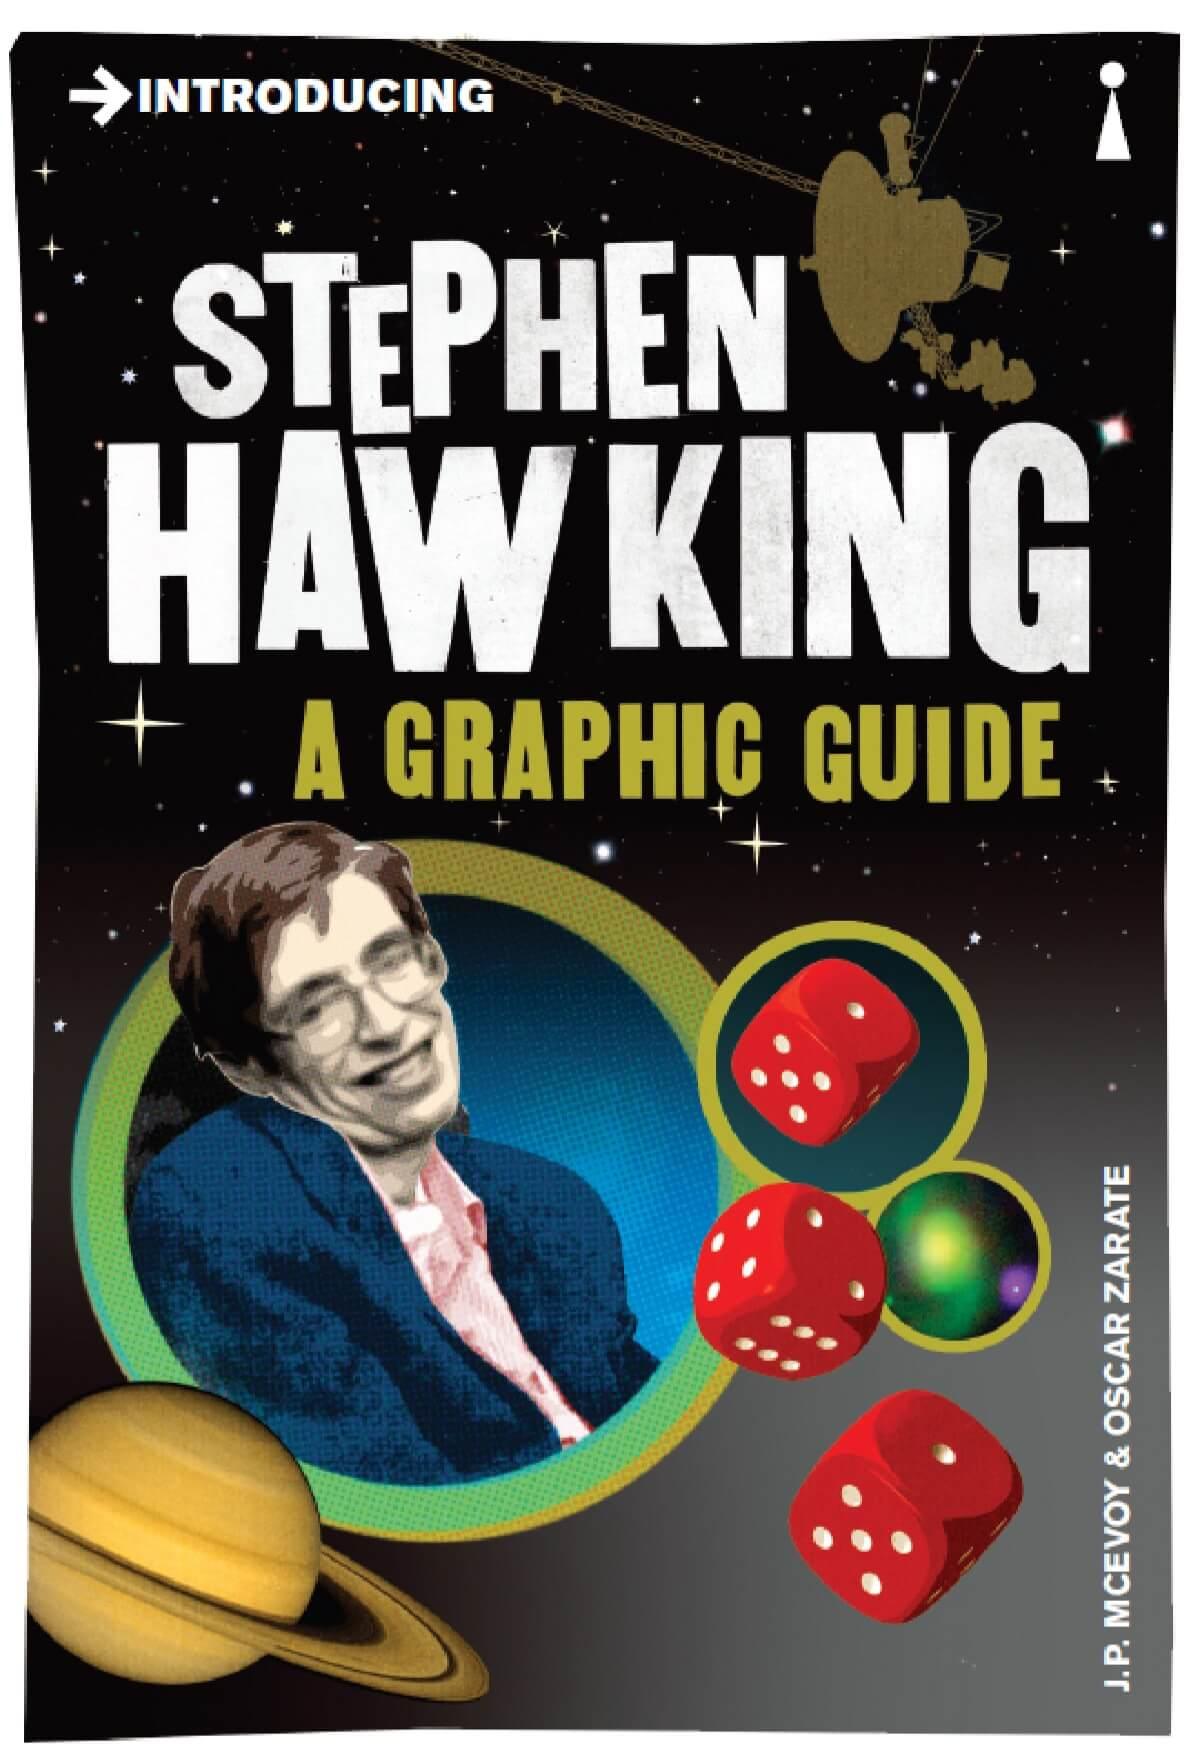 Introducing Stephen Hawking: Cerita tentang Semesta dan Fisika